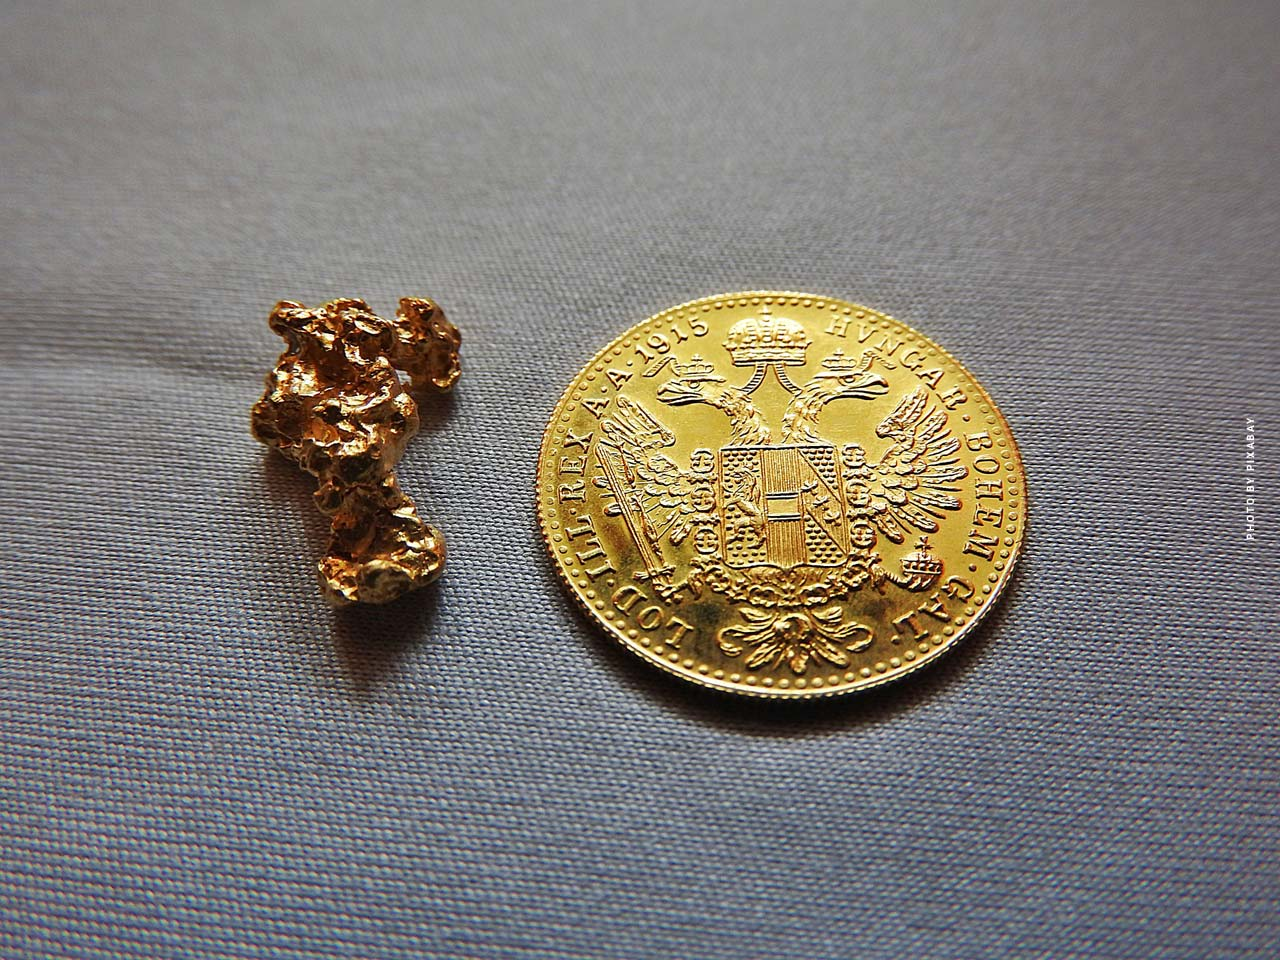 Kapitalanlage Edelmetalle: Gold, Silber, Platin & Palladium - Aktueller Kurs